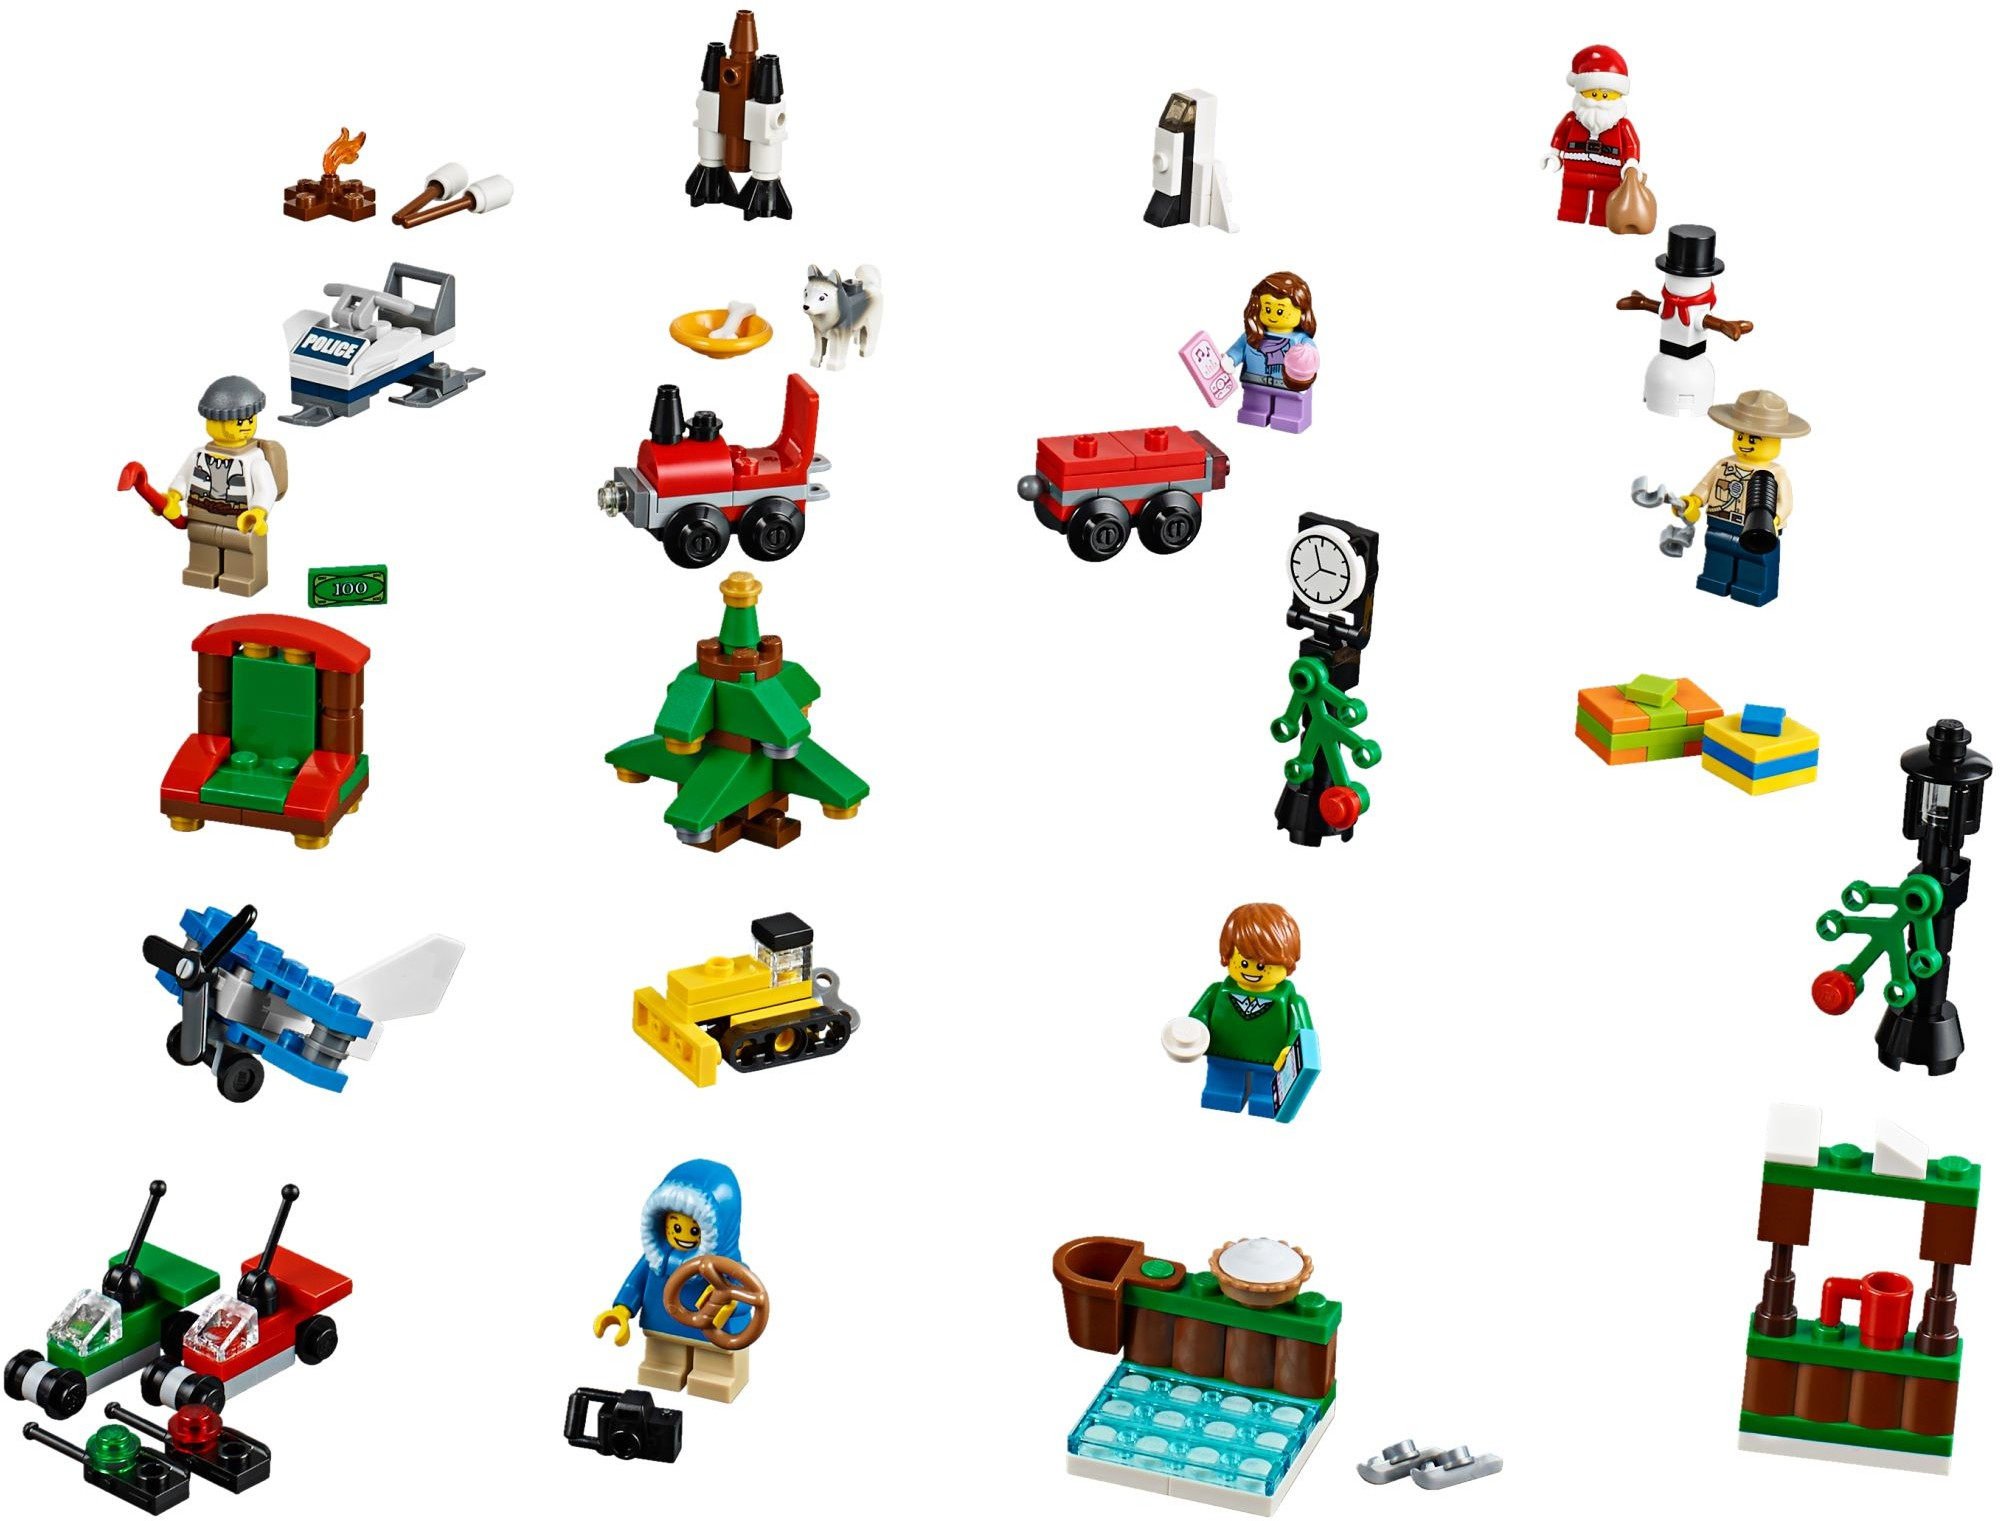 City : Lego City Advent Calendar Instructions 60099 City in Lego Star Wars Advent Calendar 2011 Instructions